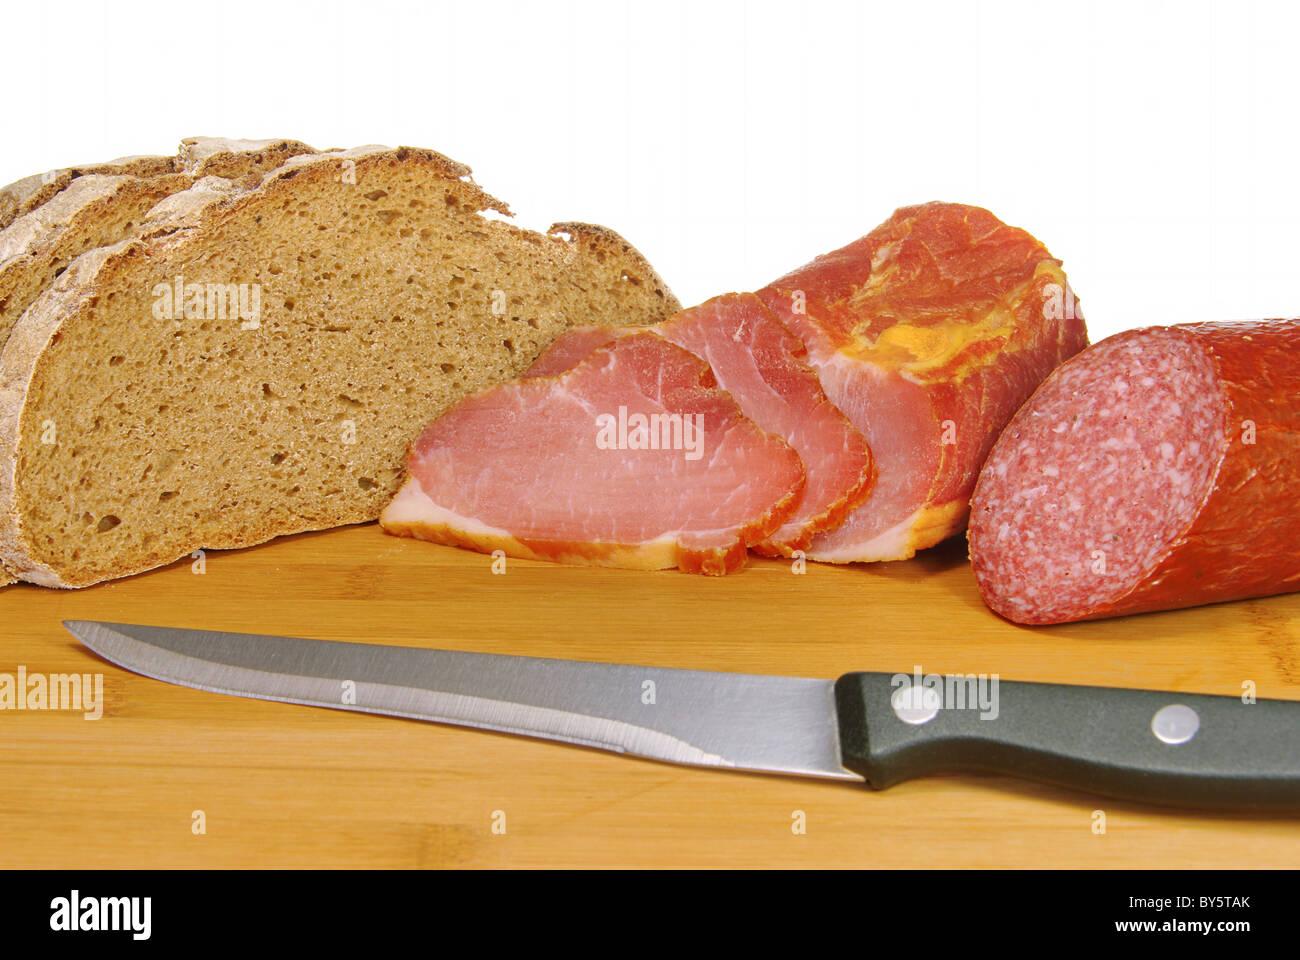 Schinken Brot Salami - ham bread salami 01 - Stock Image